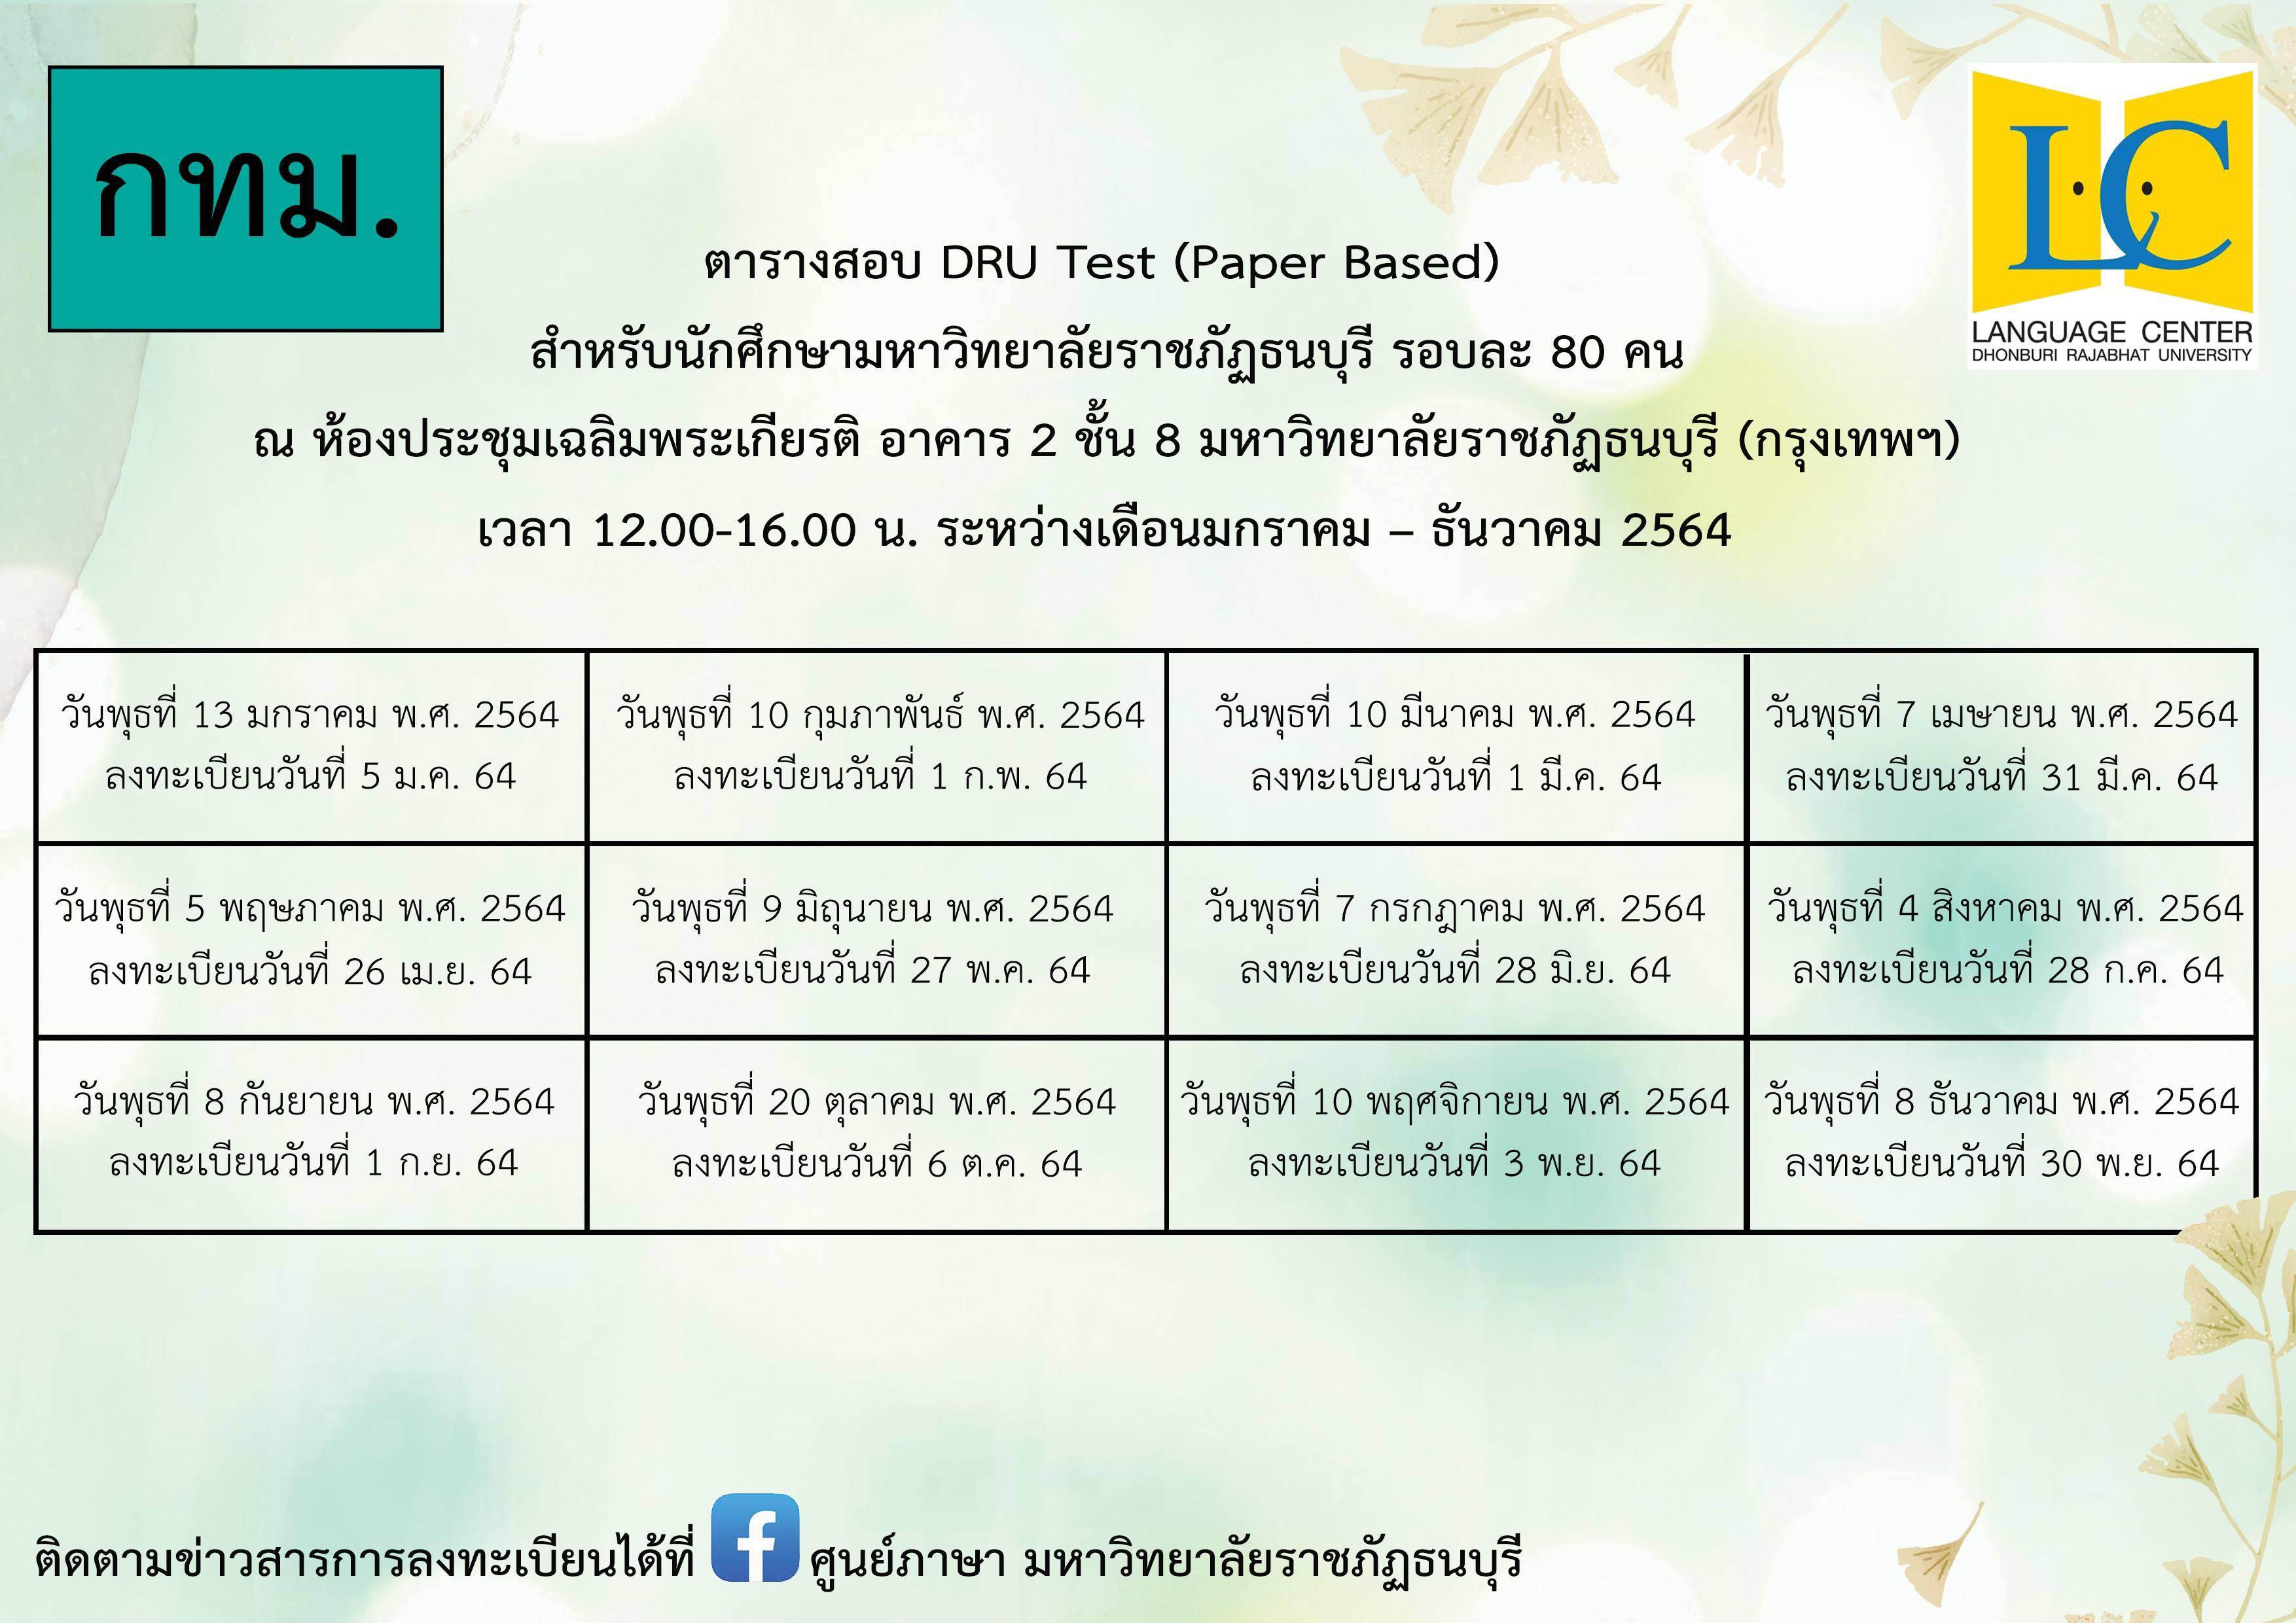 DRU Test (paper-based) schedule @ Bangkok